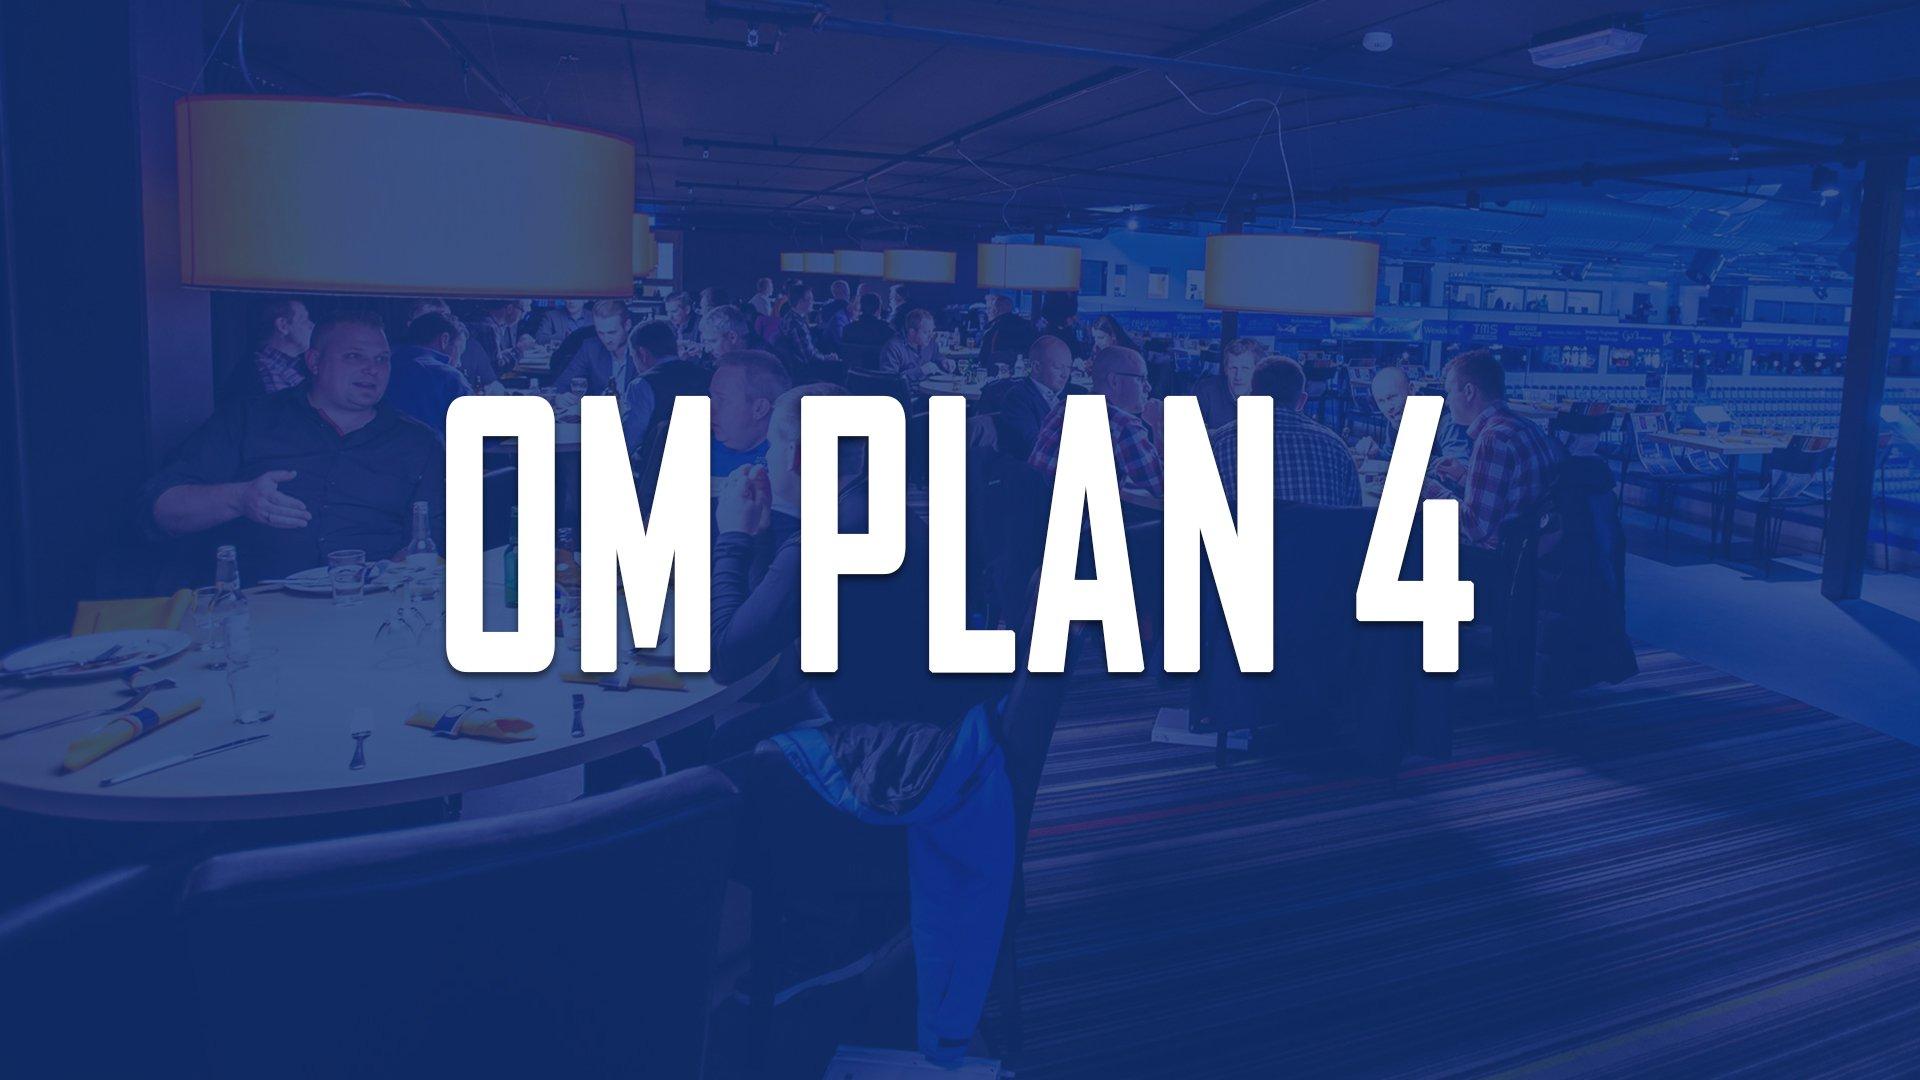 om plan 4